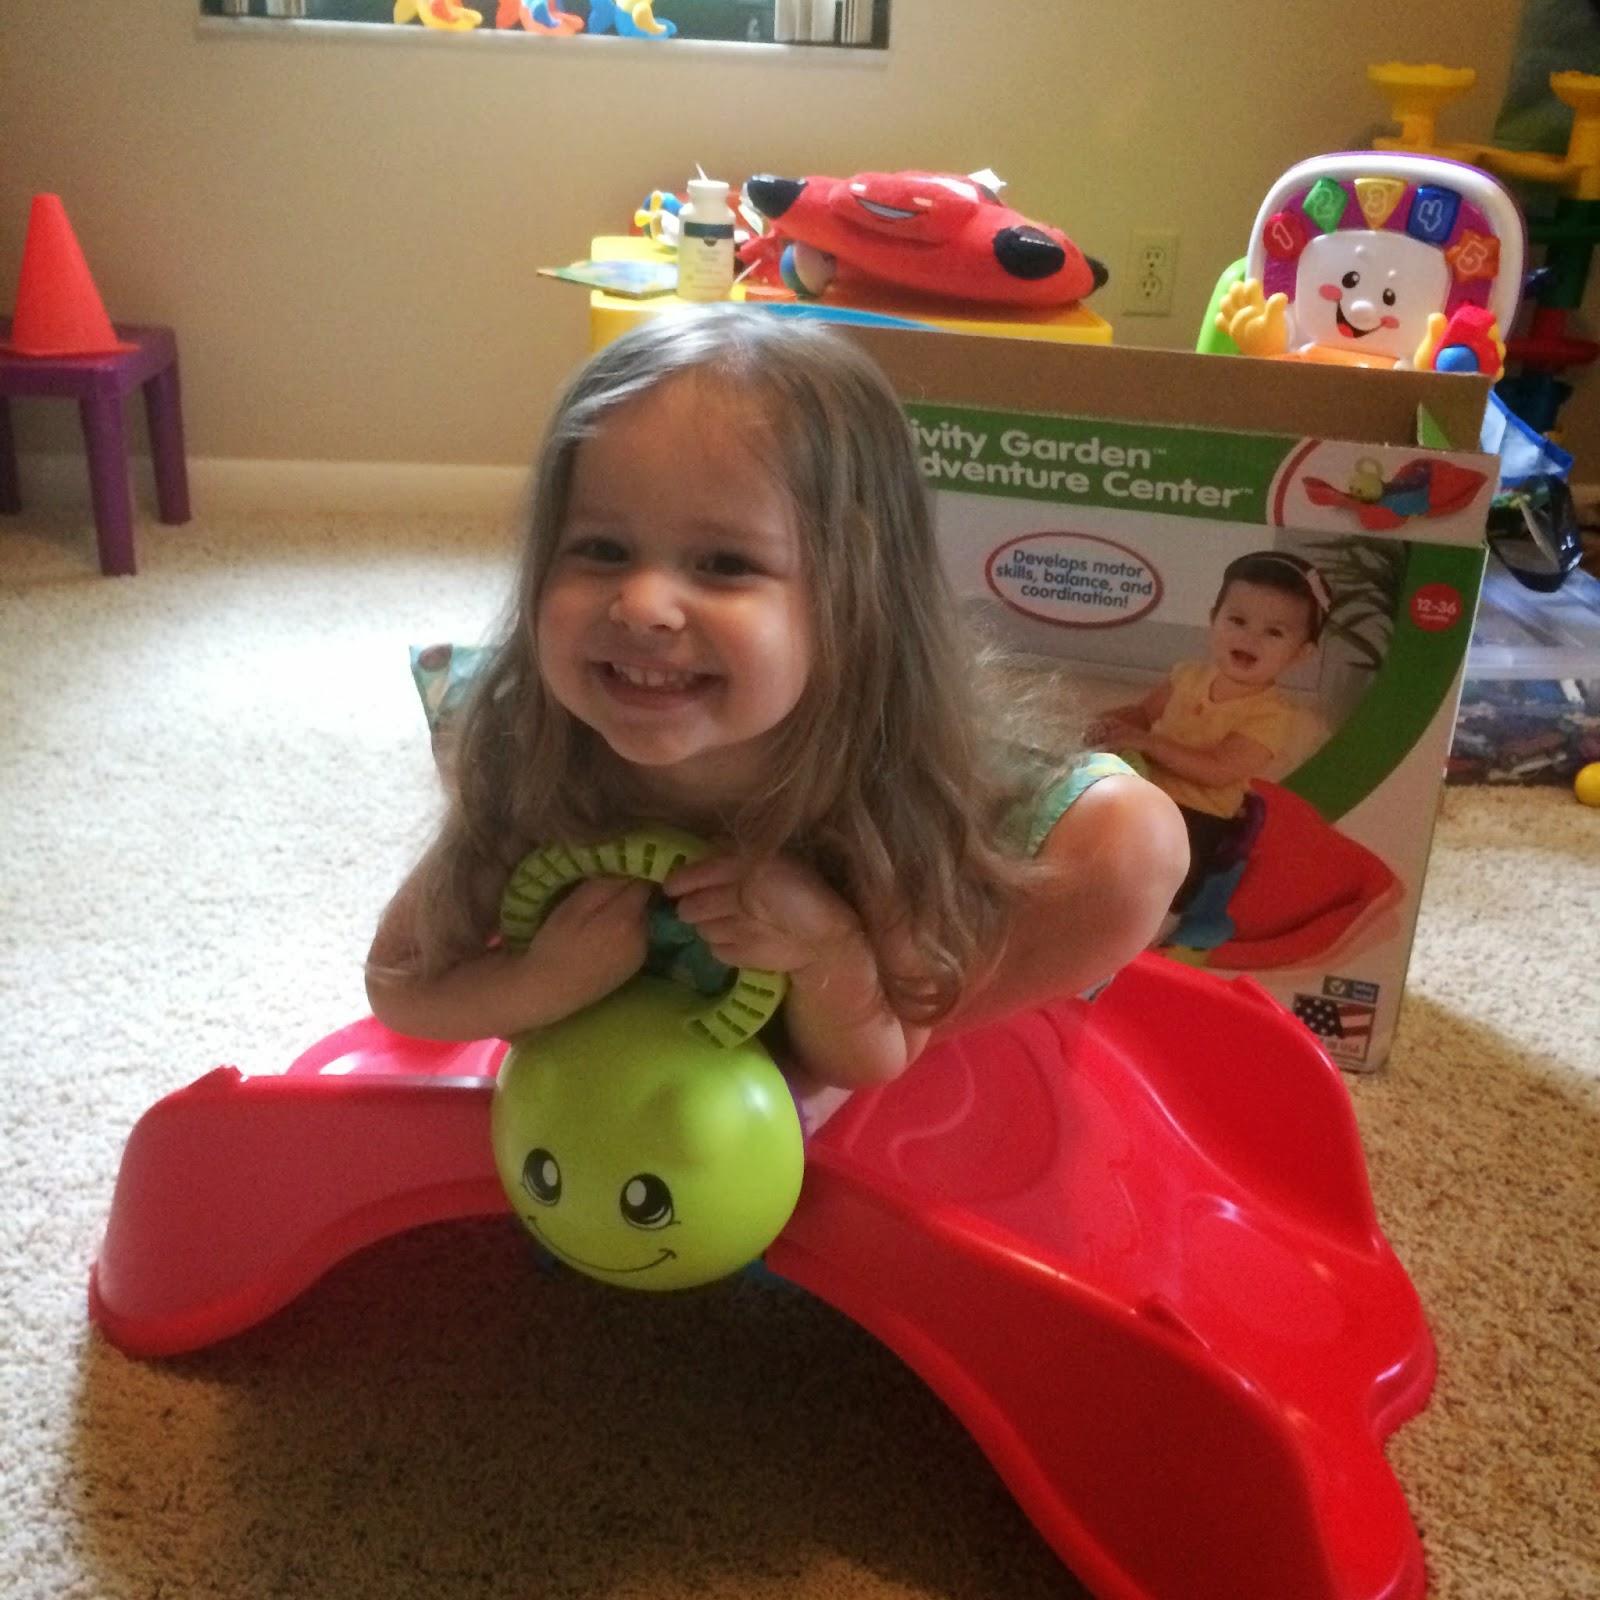 Little Tikes Activity Garden 3-in-1 Adventure Center Toy Review ...